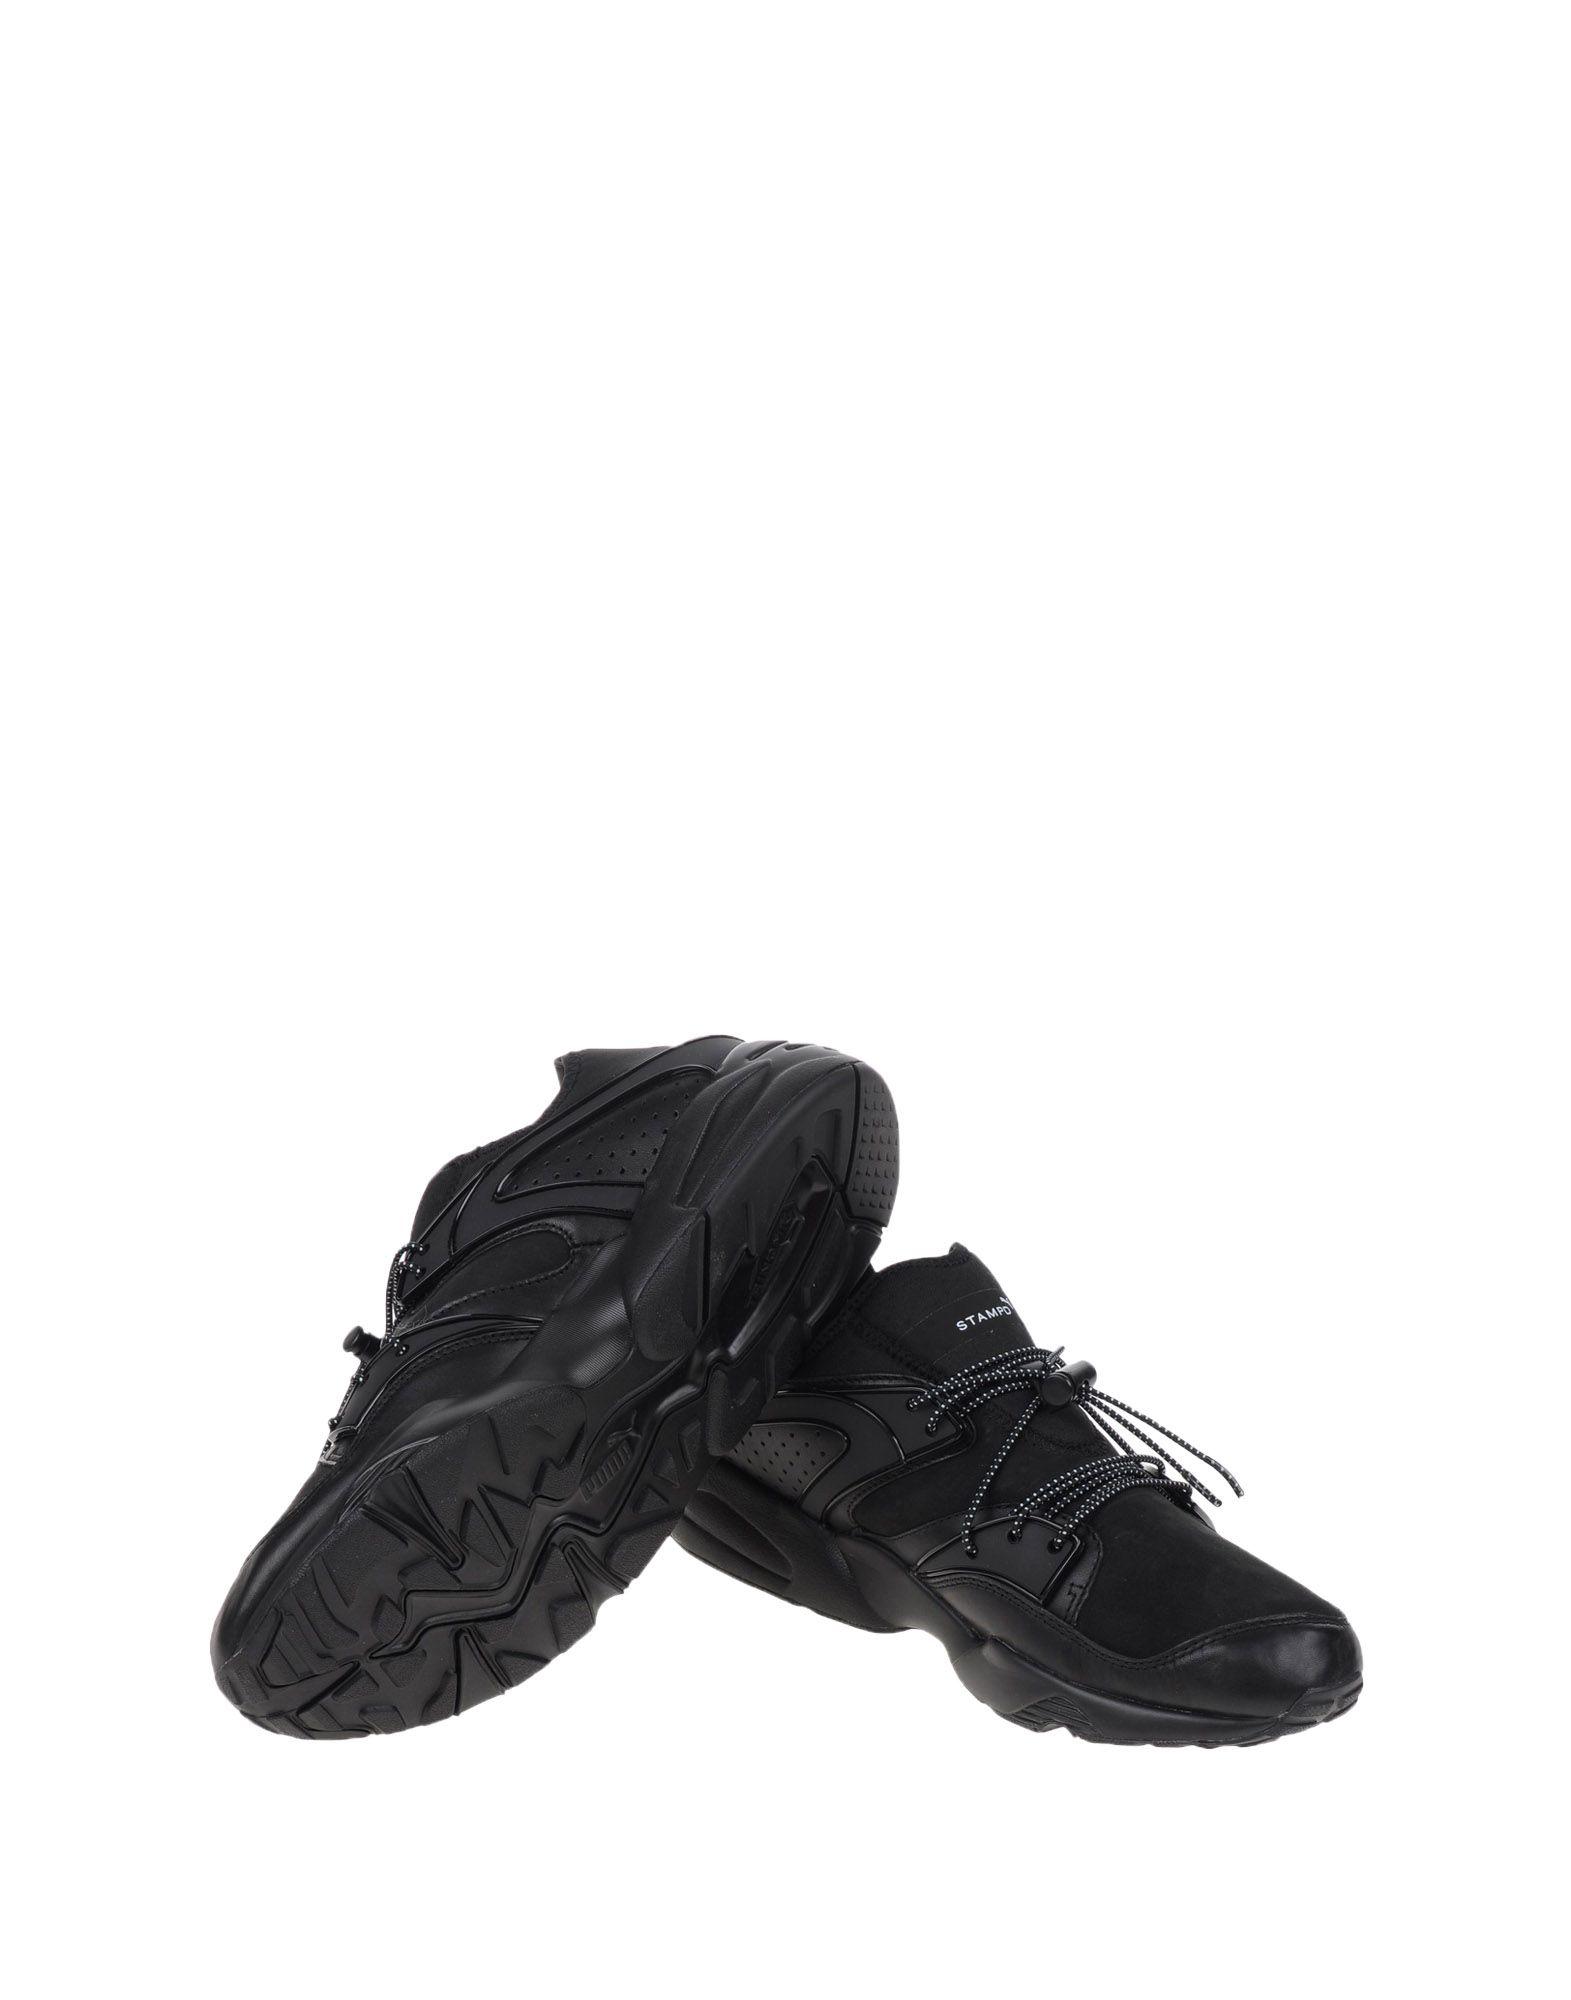 Sneakers Stampd X Puma 359806-Blaze Of Glory X Stampd - Homme - Sneakers Stampd X Puma sur